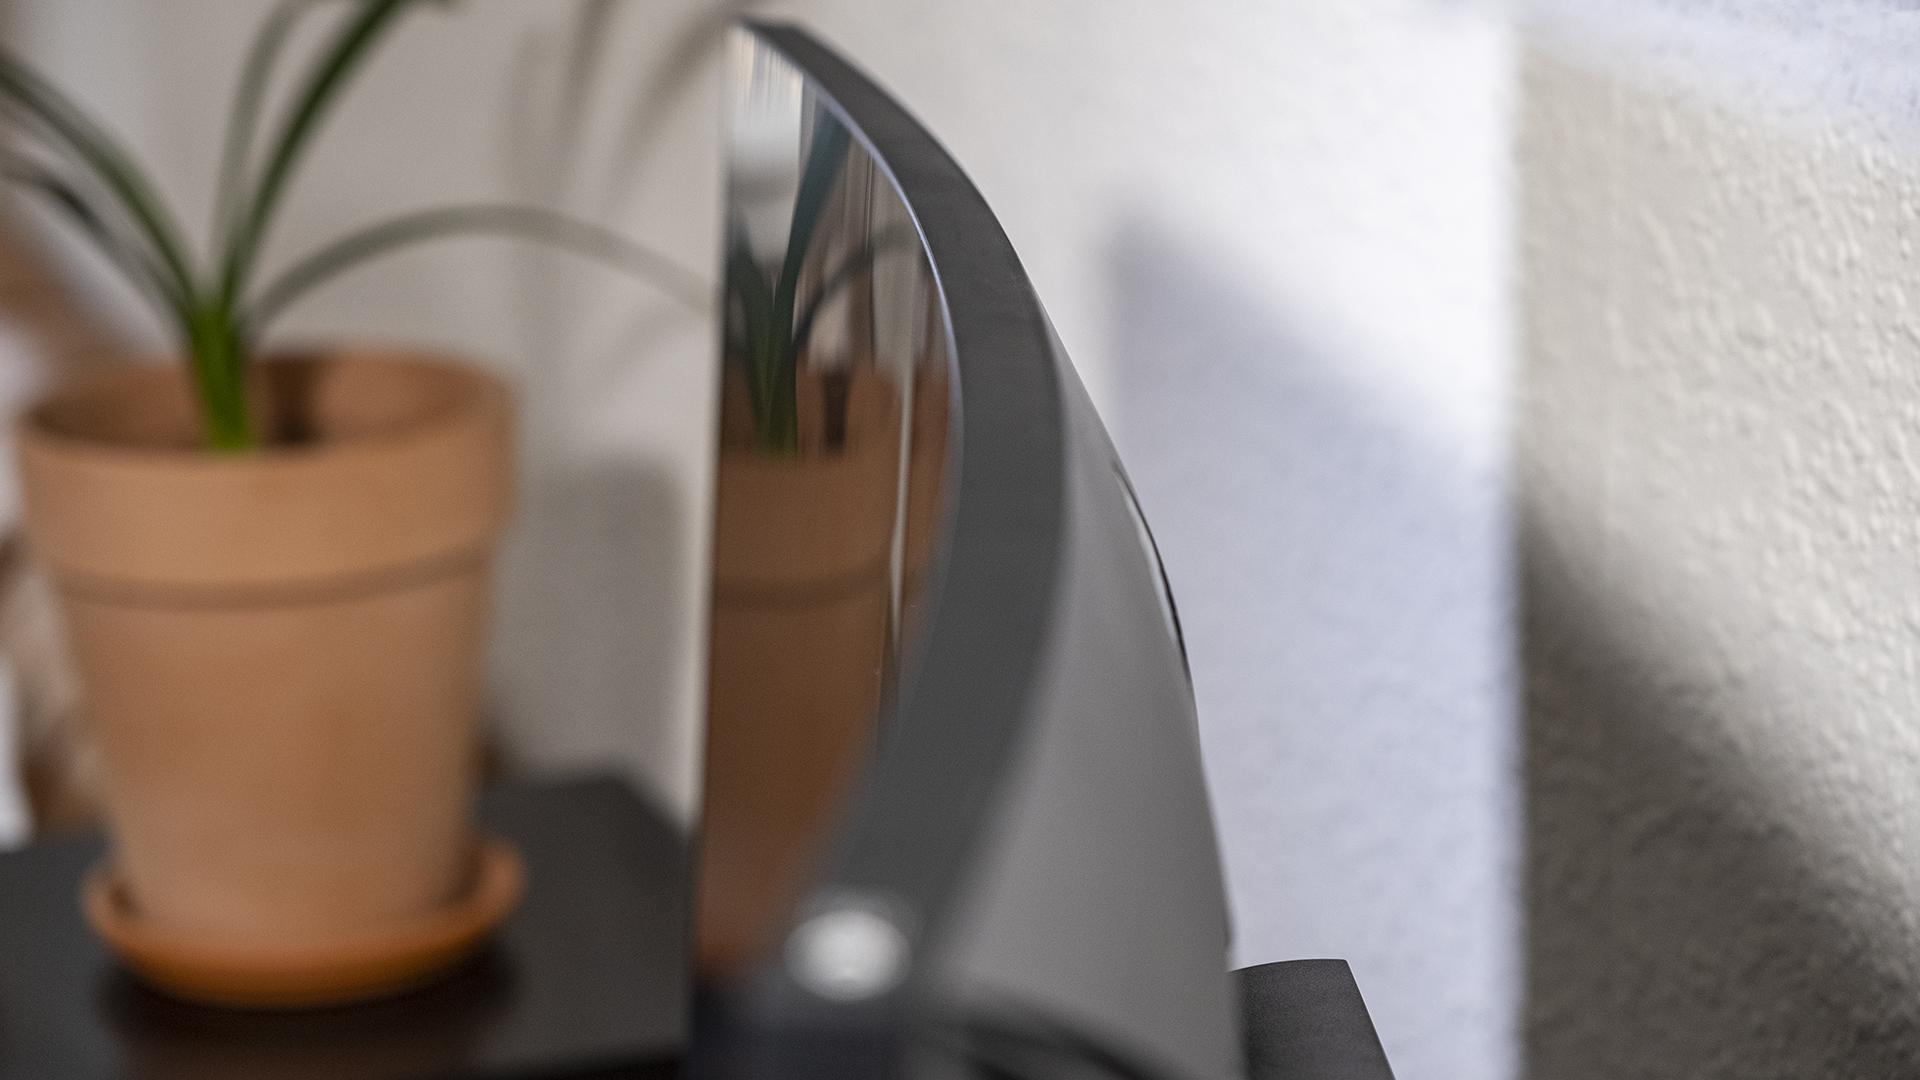 Eizo FlexScan BV3895 Curvature Curved Kruemmung 2300R